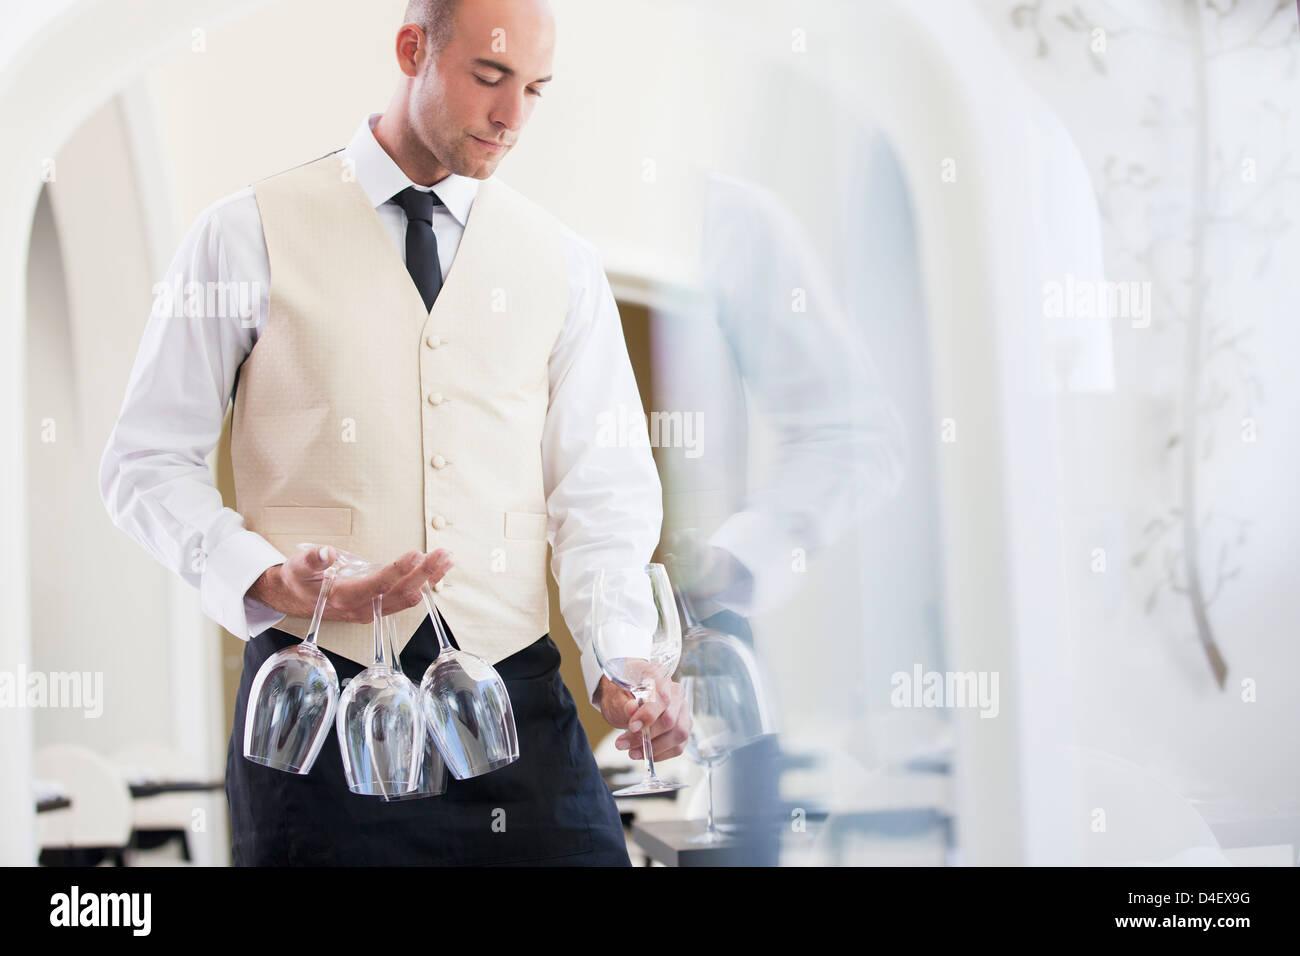 Kellner tragen Wein Gläser im restaurant Stockbild